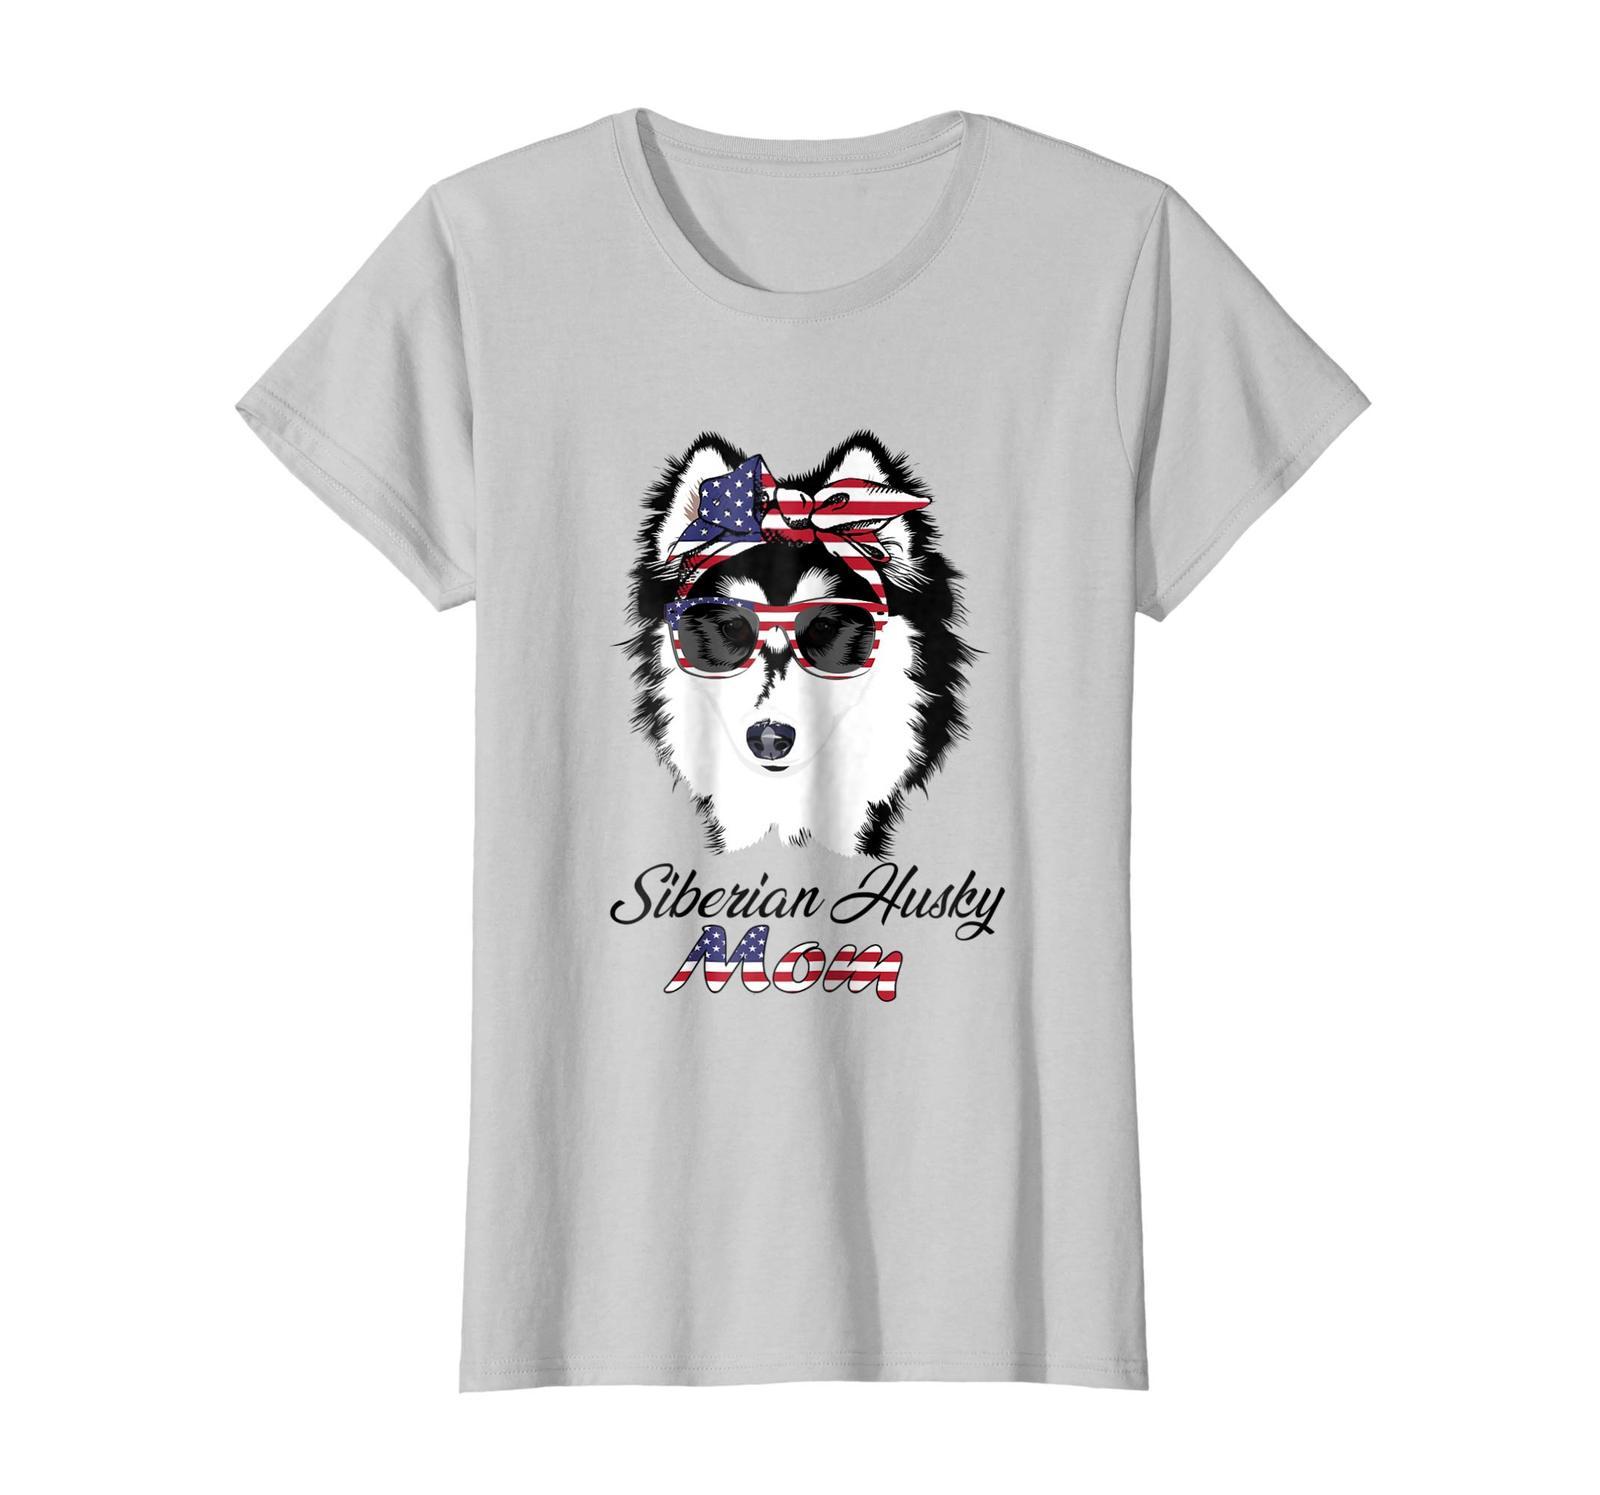 Dog Fashion - Husky Gift|Bandana & Glass of 4th of July|Funny Shirt Wowen